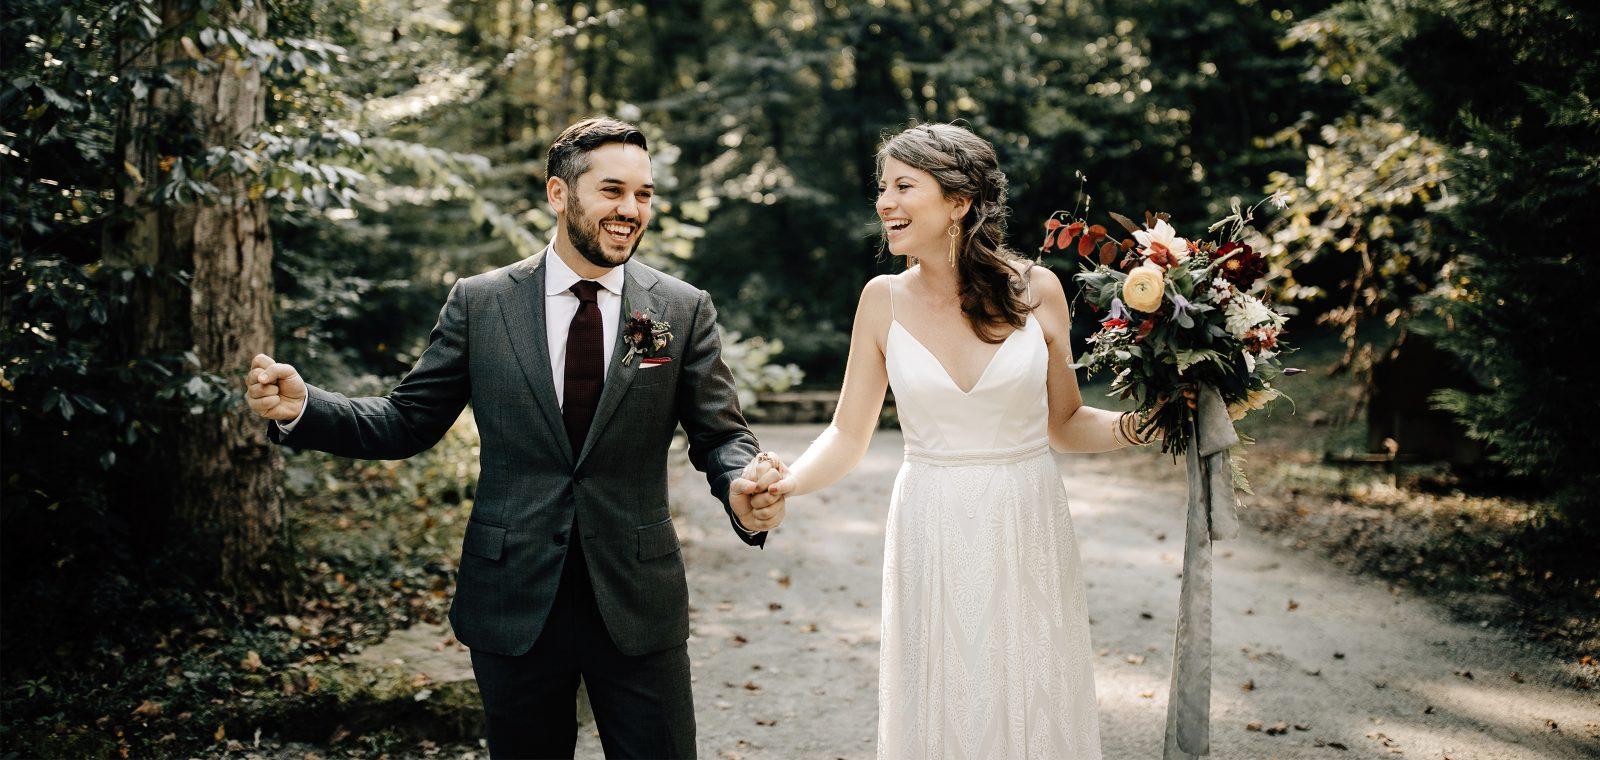 Hachland Hill Wedding – Nashville, TN – Ross & Leah